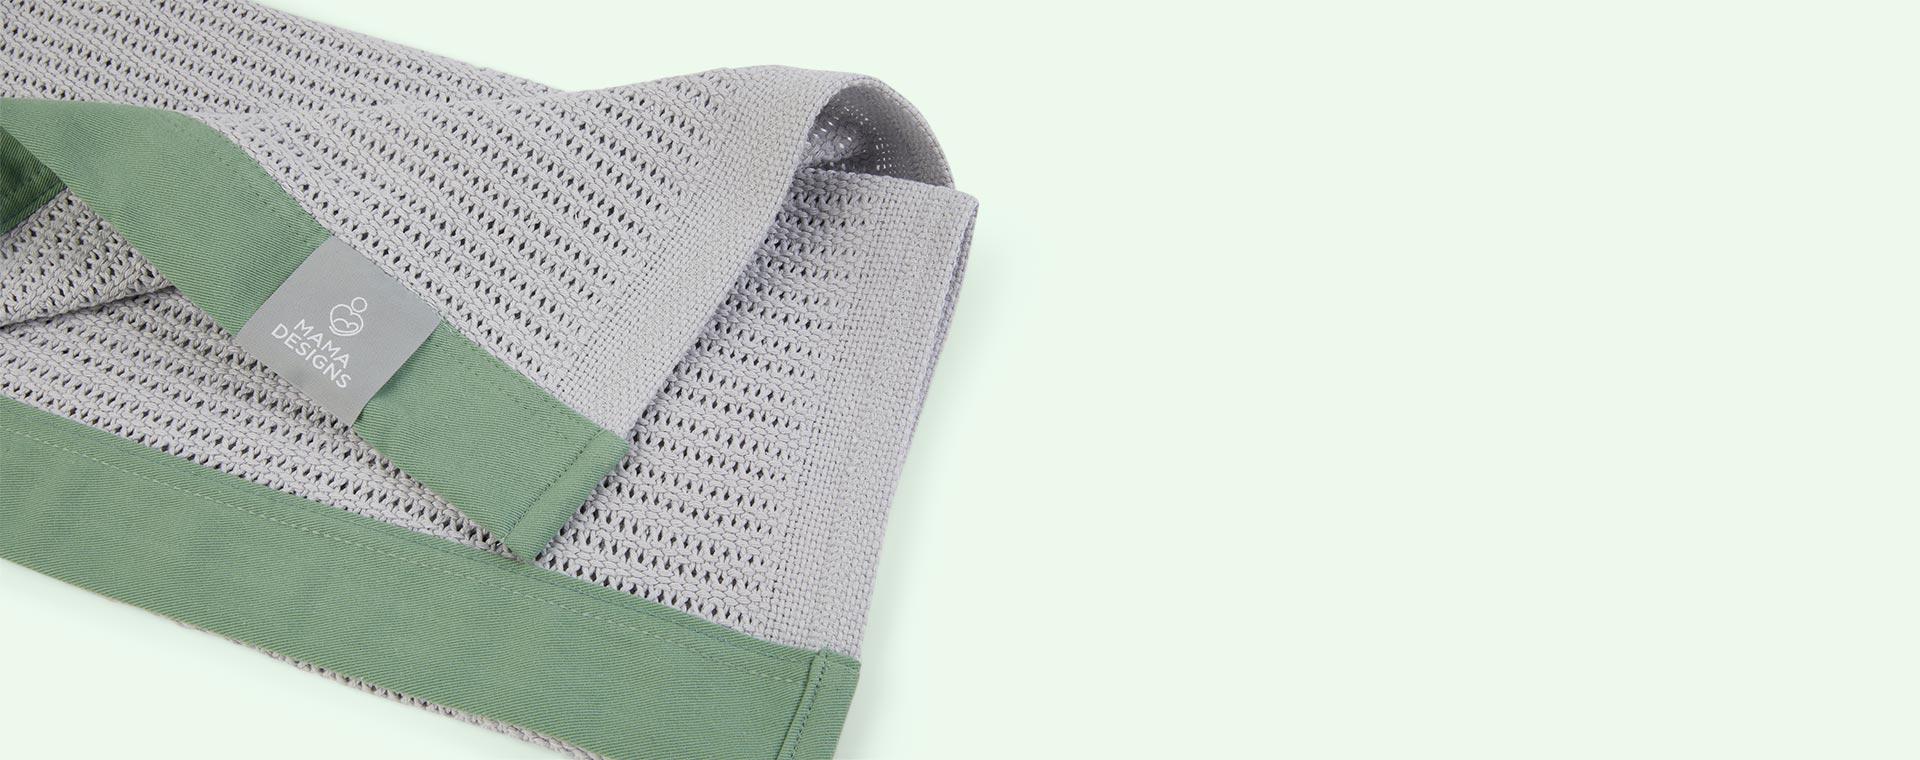 Grey With Green trim Mama Designs Cellular Blanket